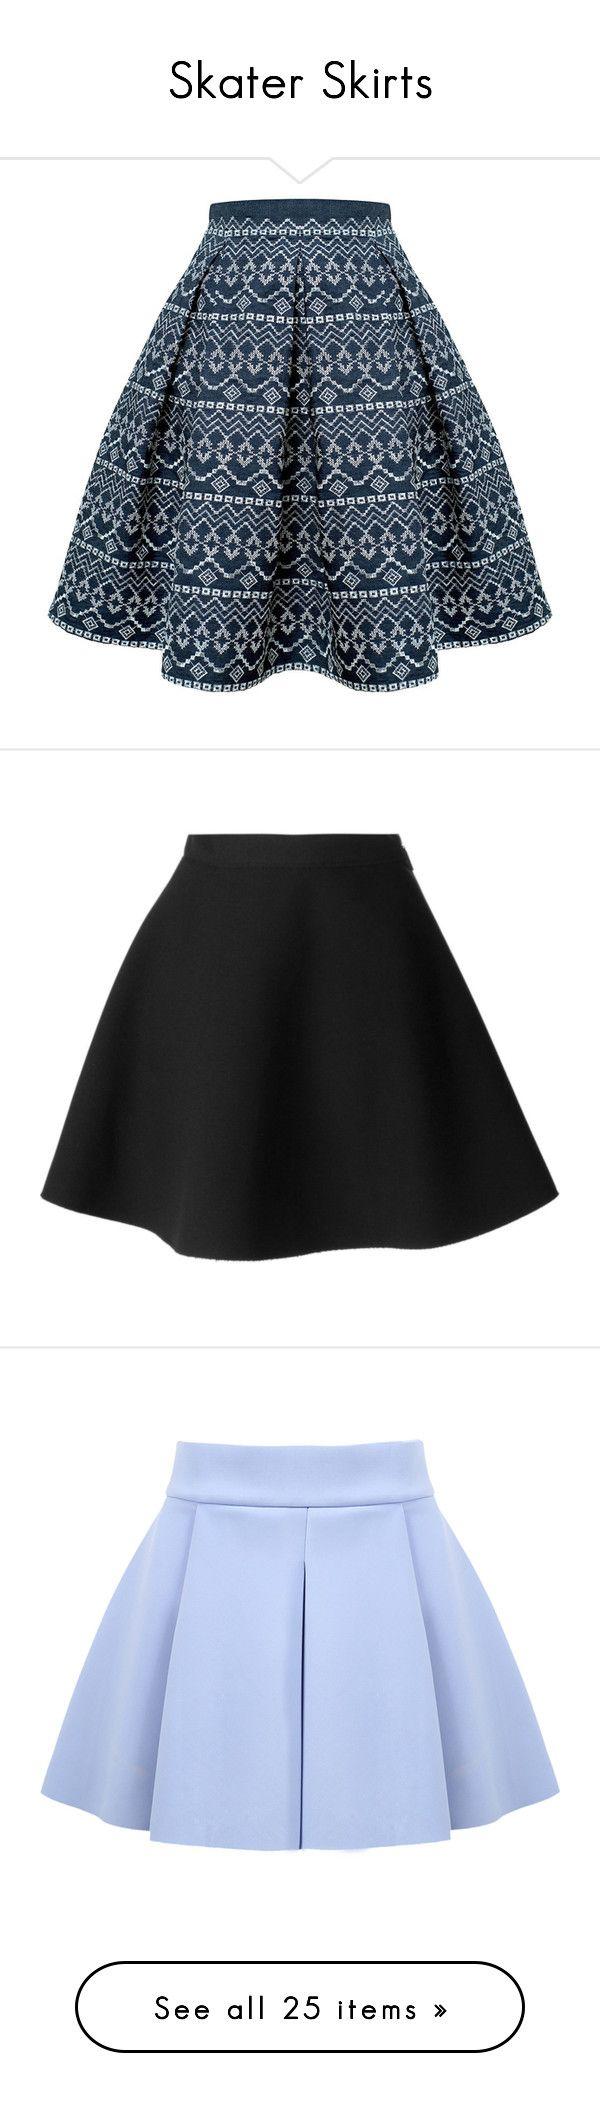 """Skater Skirts"" by brookieg711 on Polyvore featuring skirts, flared midi skirt, skater skirt, pleated midi skirt, flared skirt, flare skirt, black, black skirt, msgm skirt and black circle skirt"